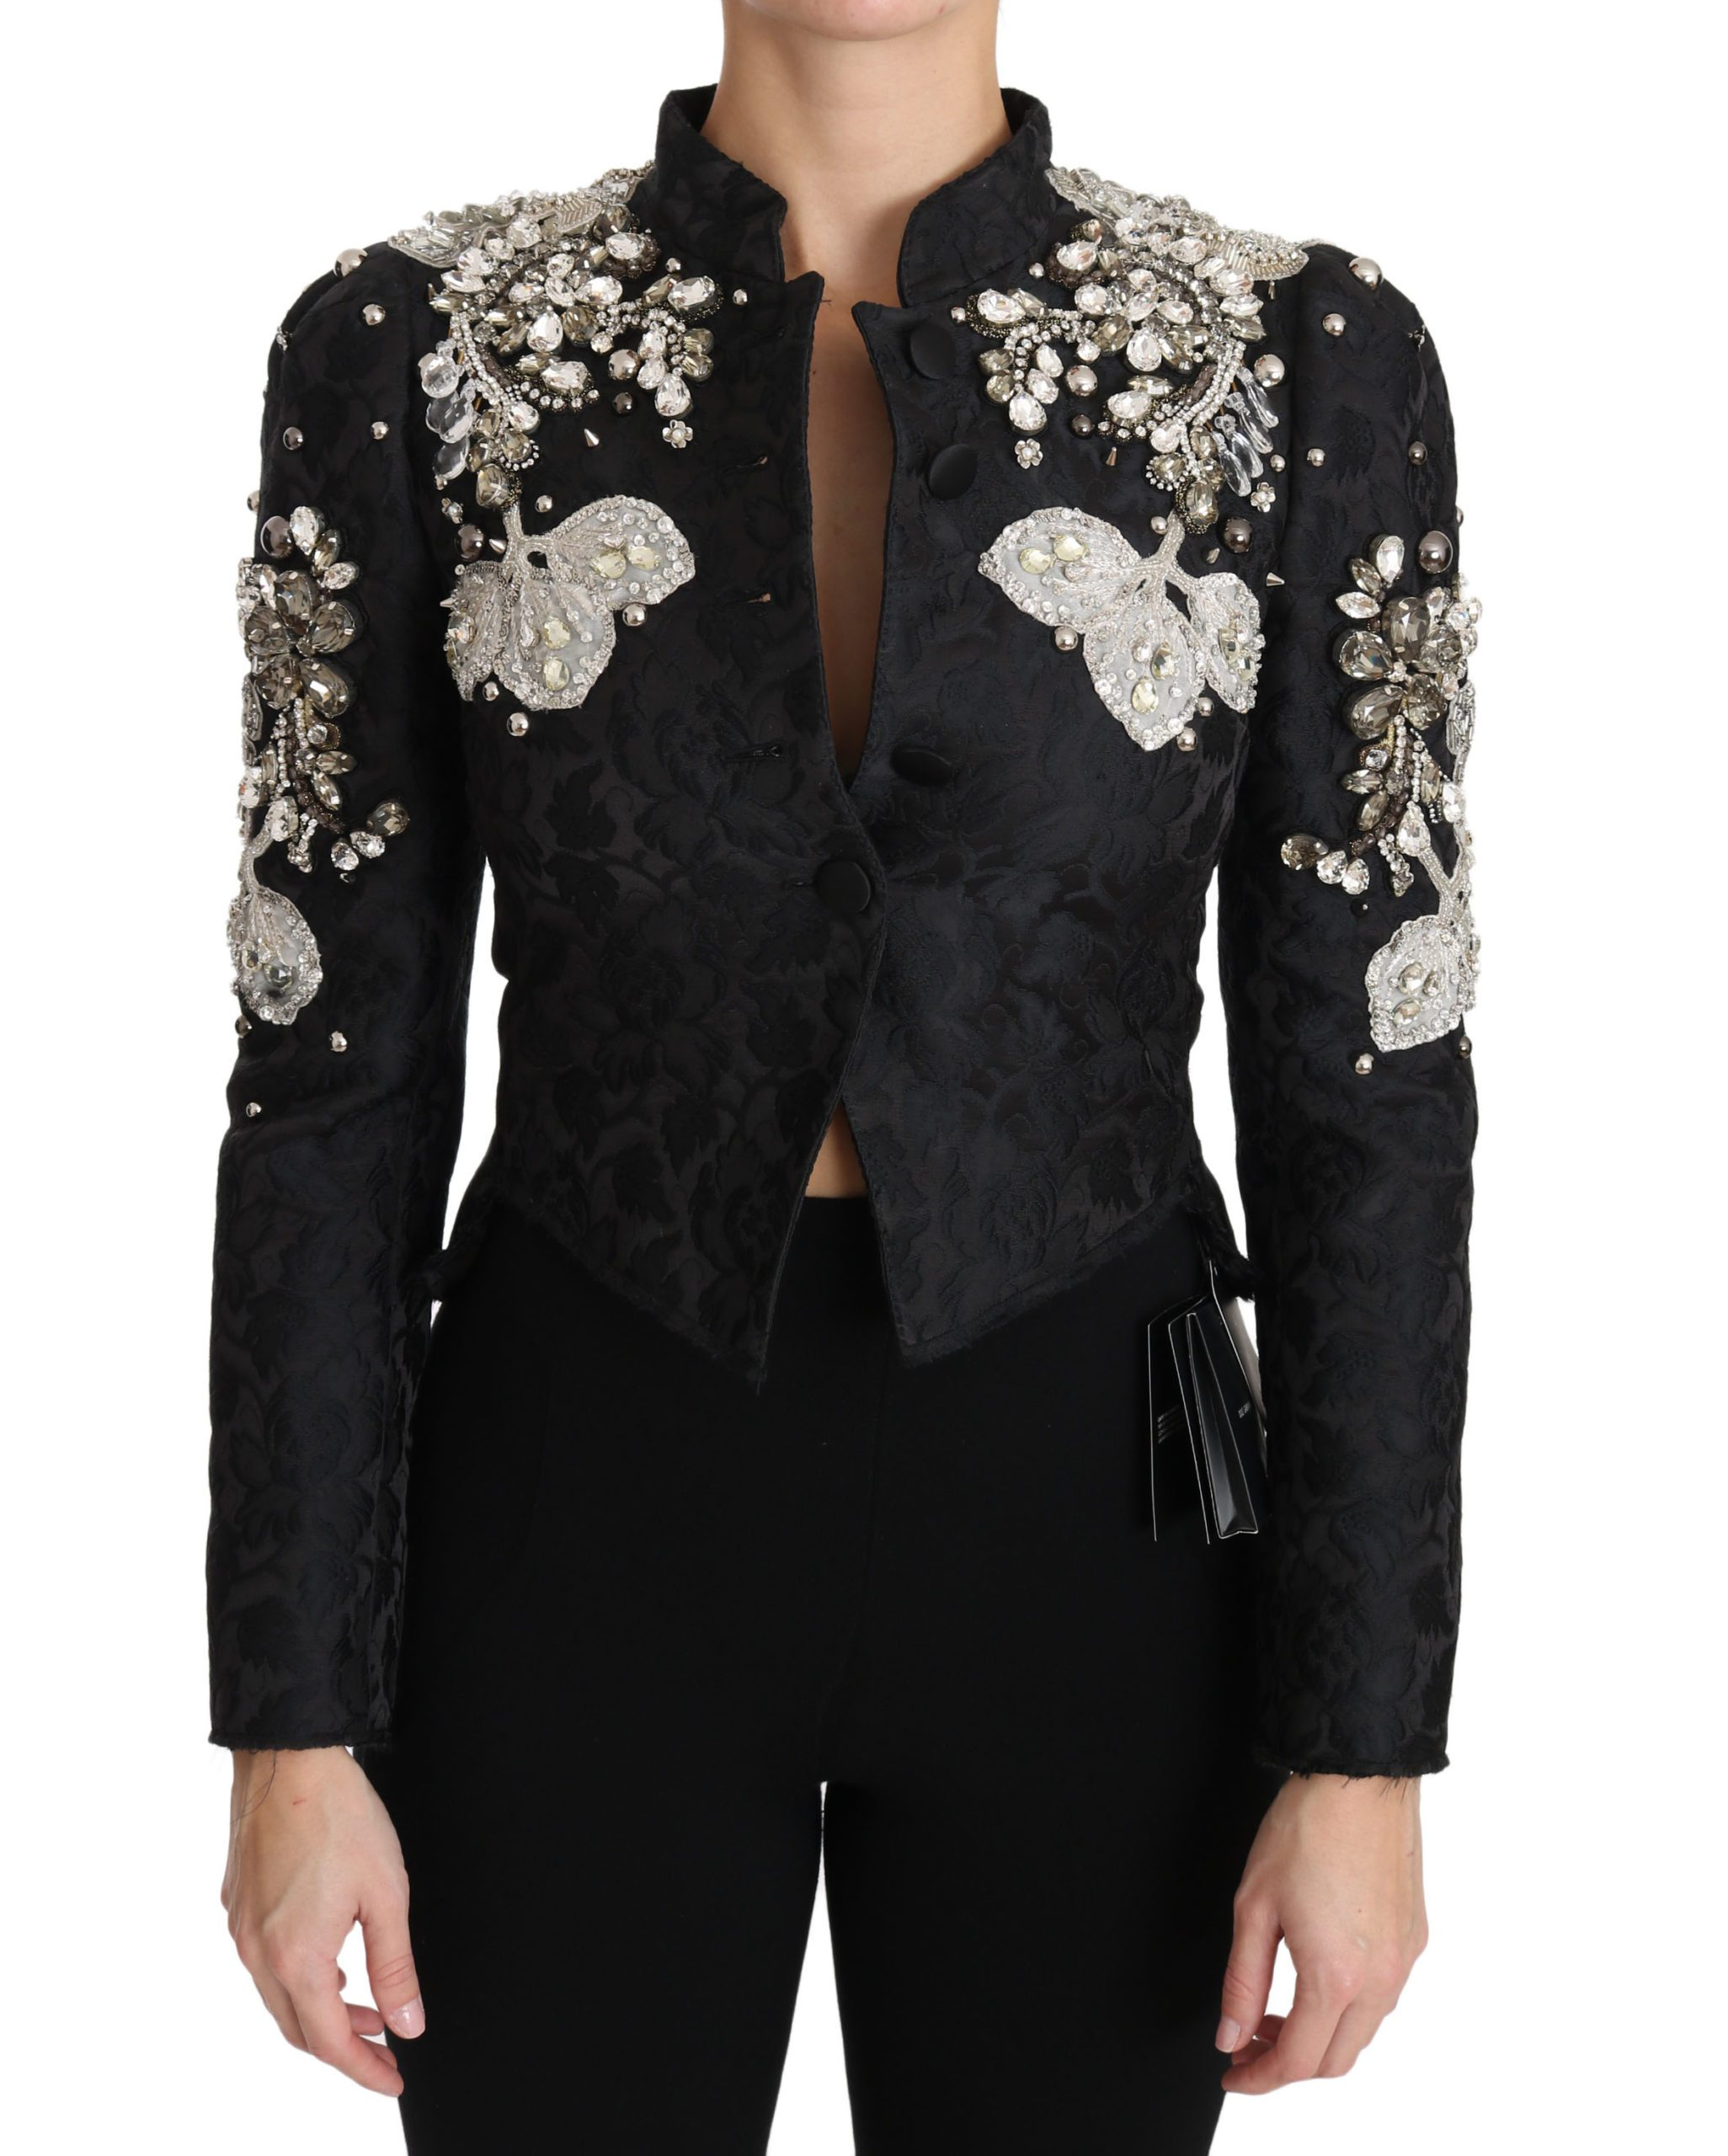 Dolce & Gabbana Women's Jacquard Crystal Floral Jacket Black JKT2403 - IT38|XS